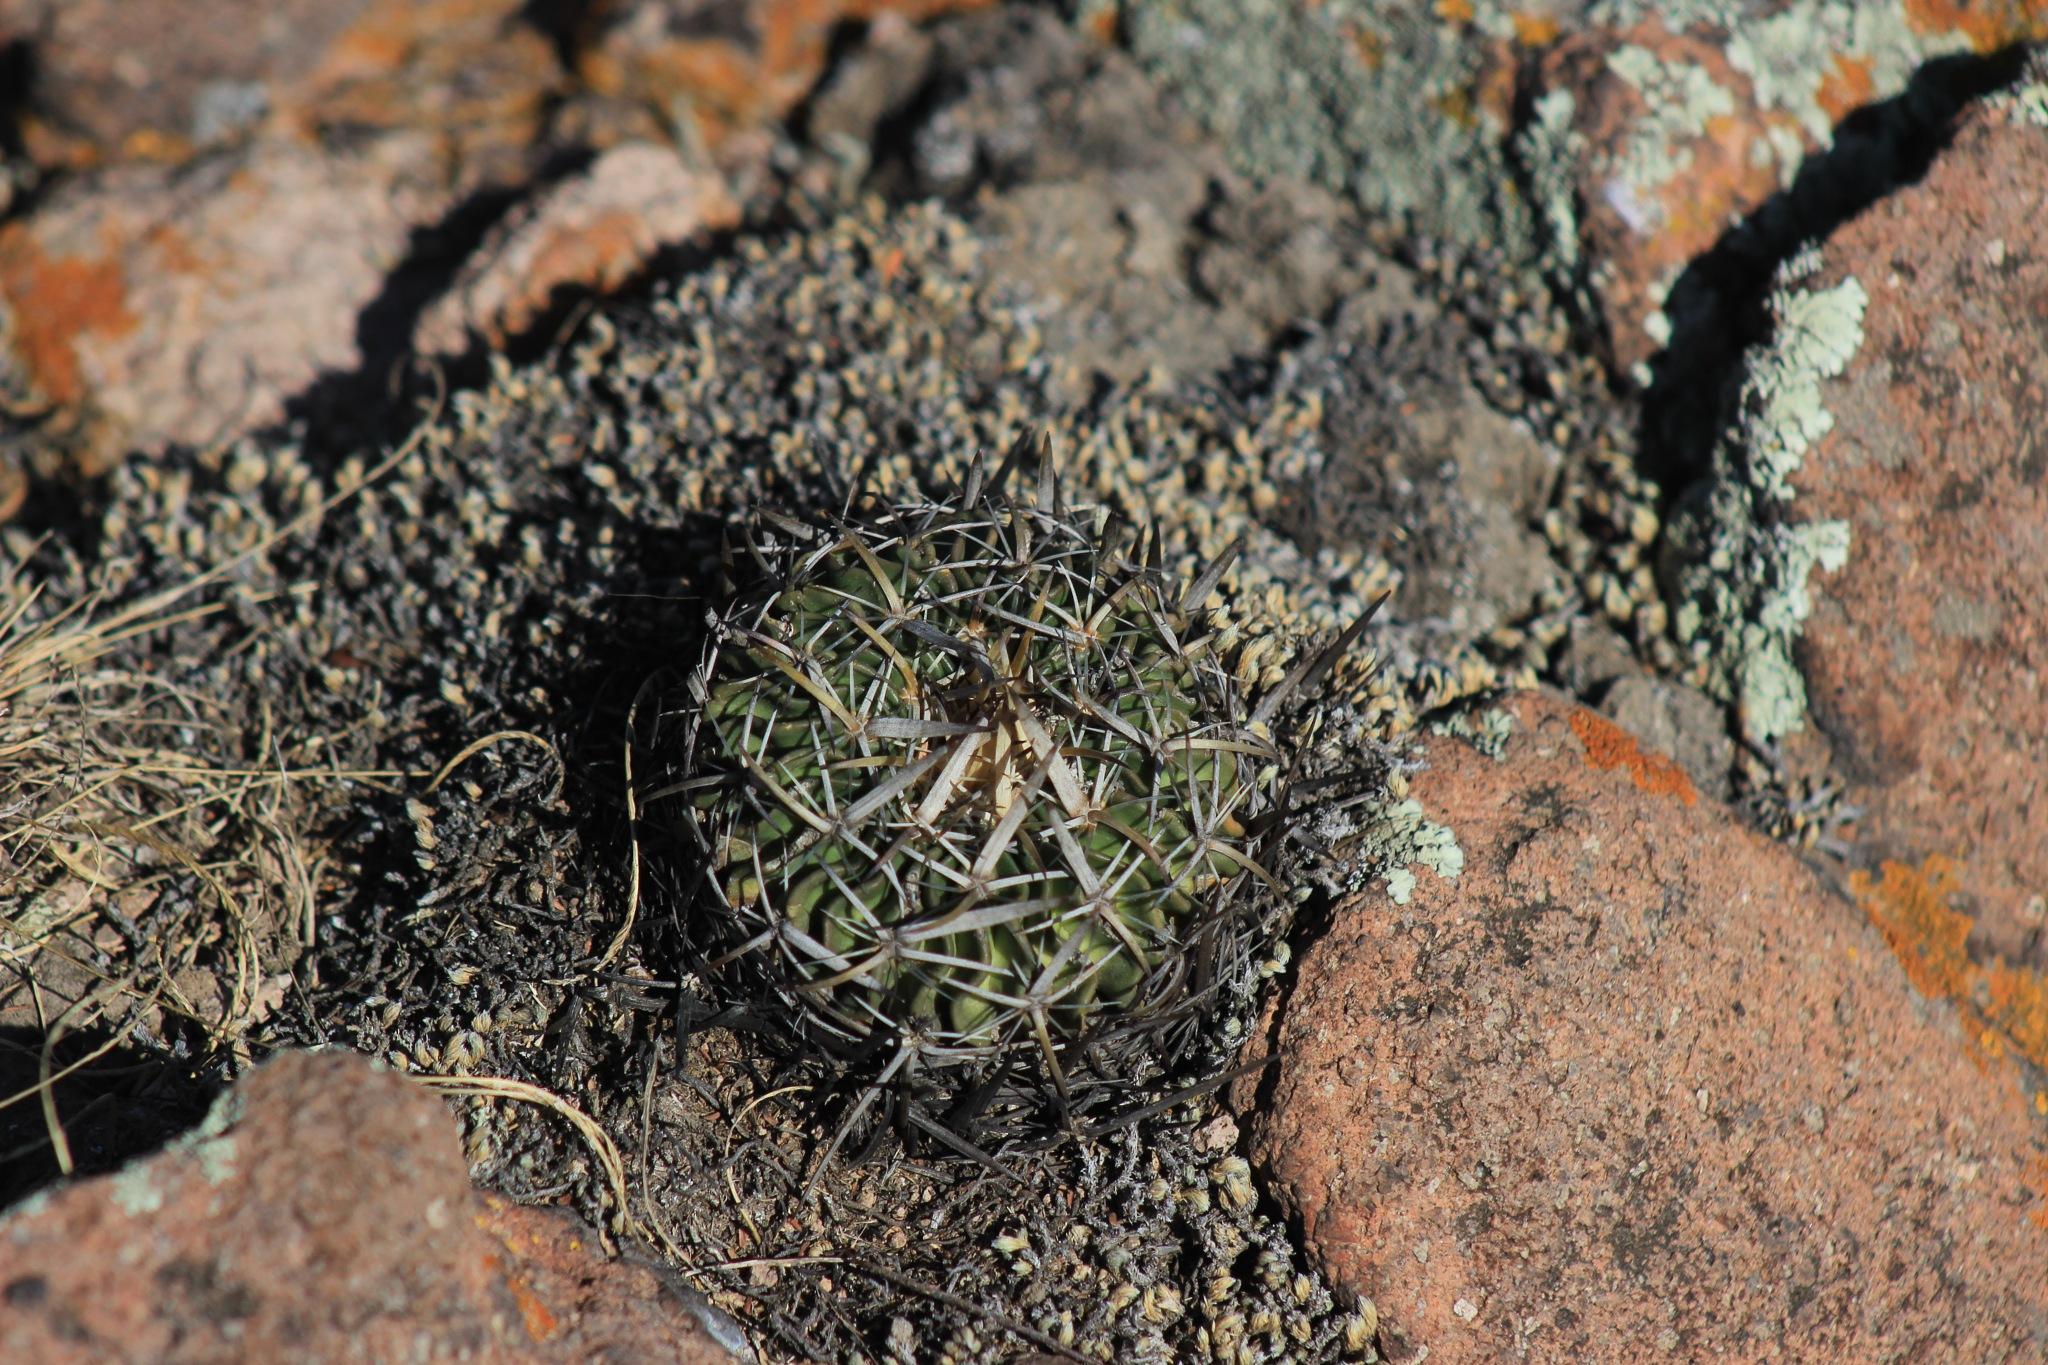 Cactus by Erick Cortés Cueto